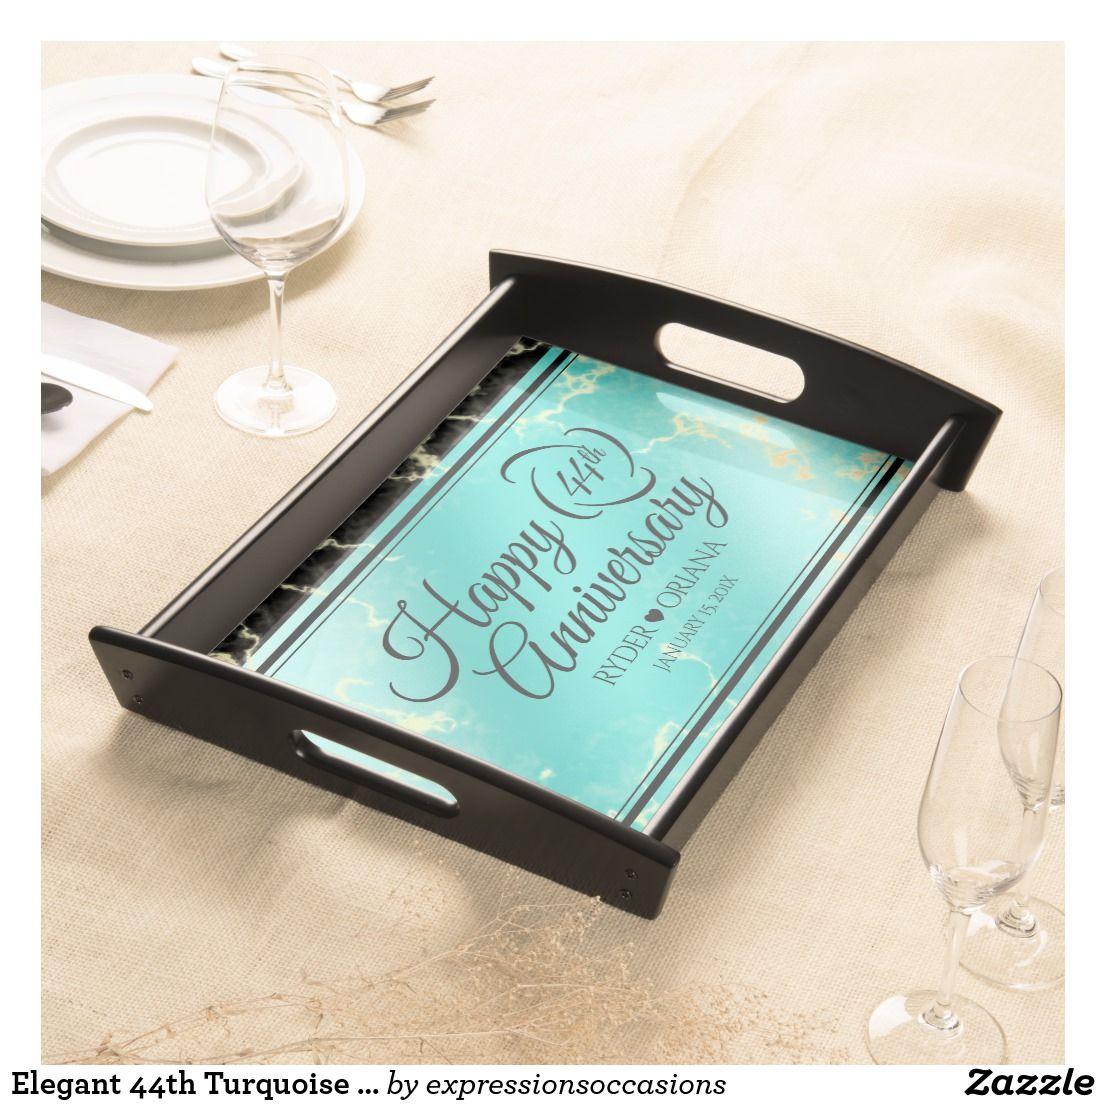 Elegant 44th Turquoise Wedding Anniversary Serving Tray